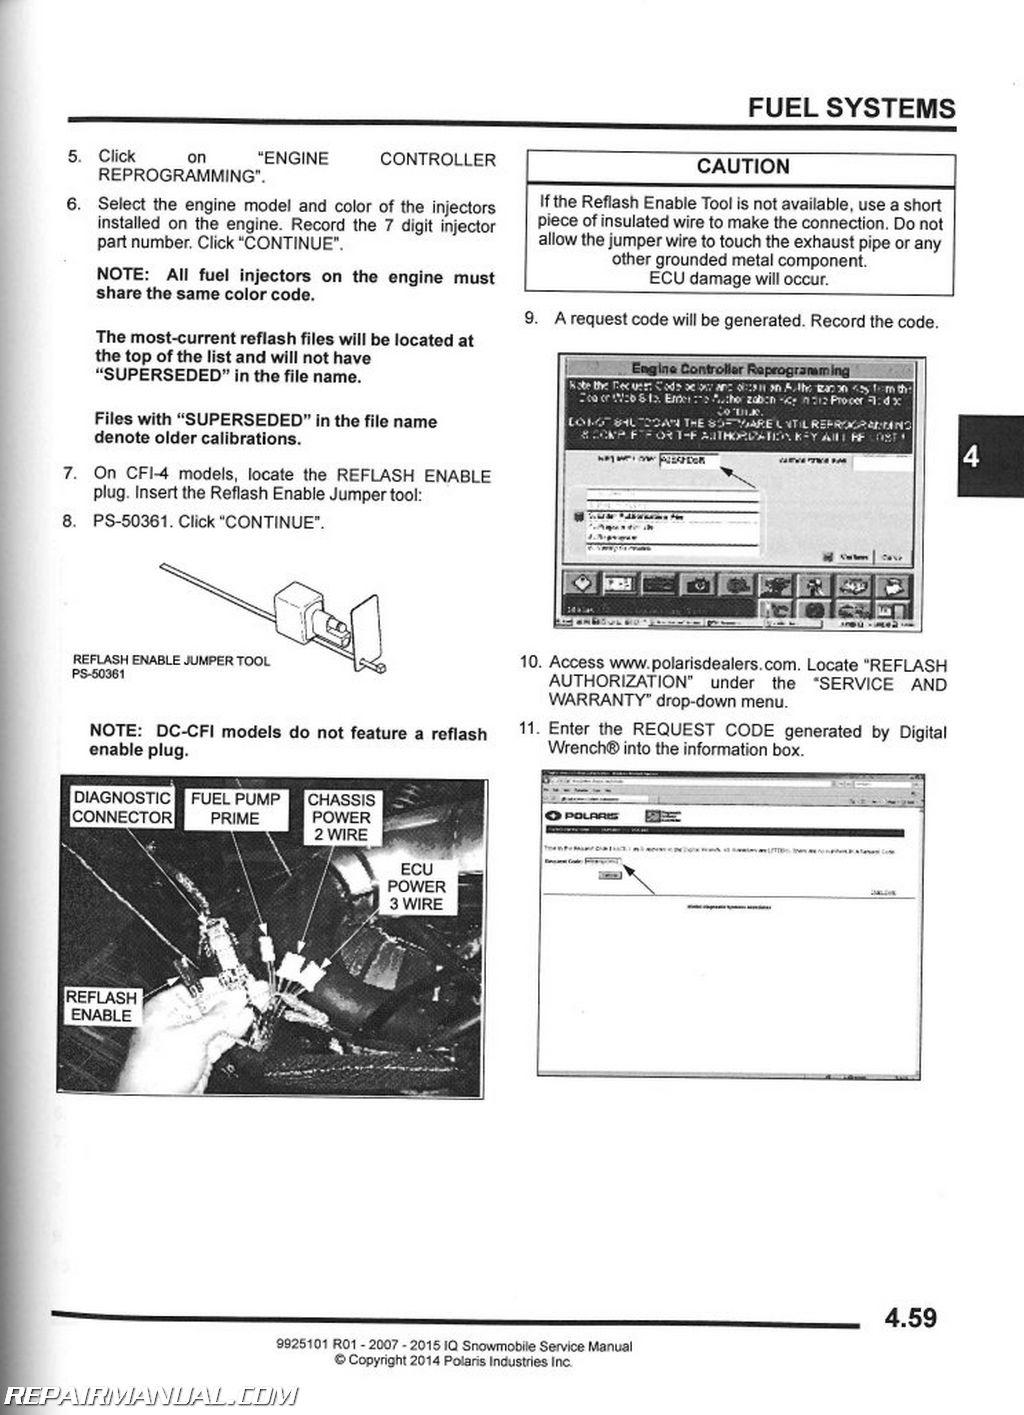 2007 2016 polaris iq snowmobile service manual rh repairmanual com 2001 Polaris Snowmobile Polaris Snowmobile Illustration